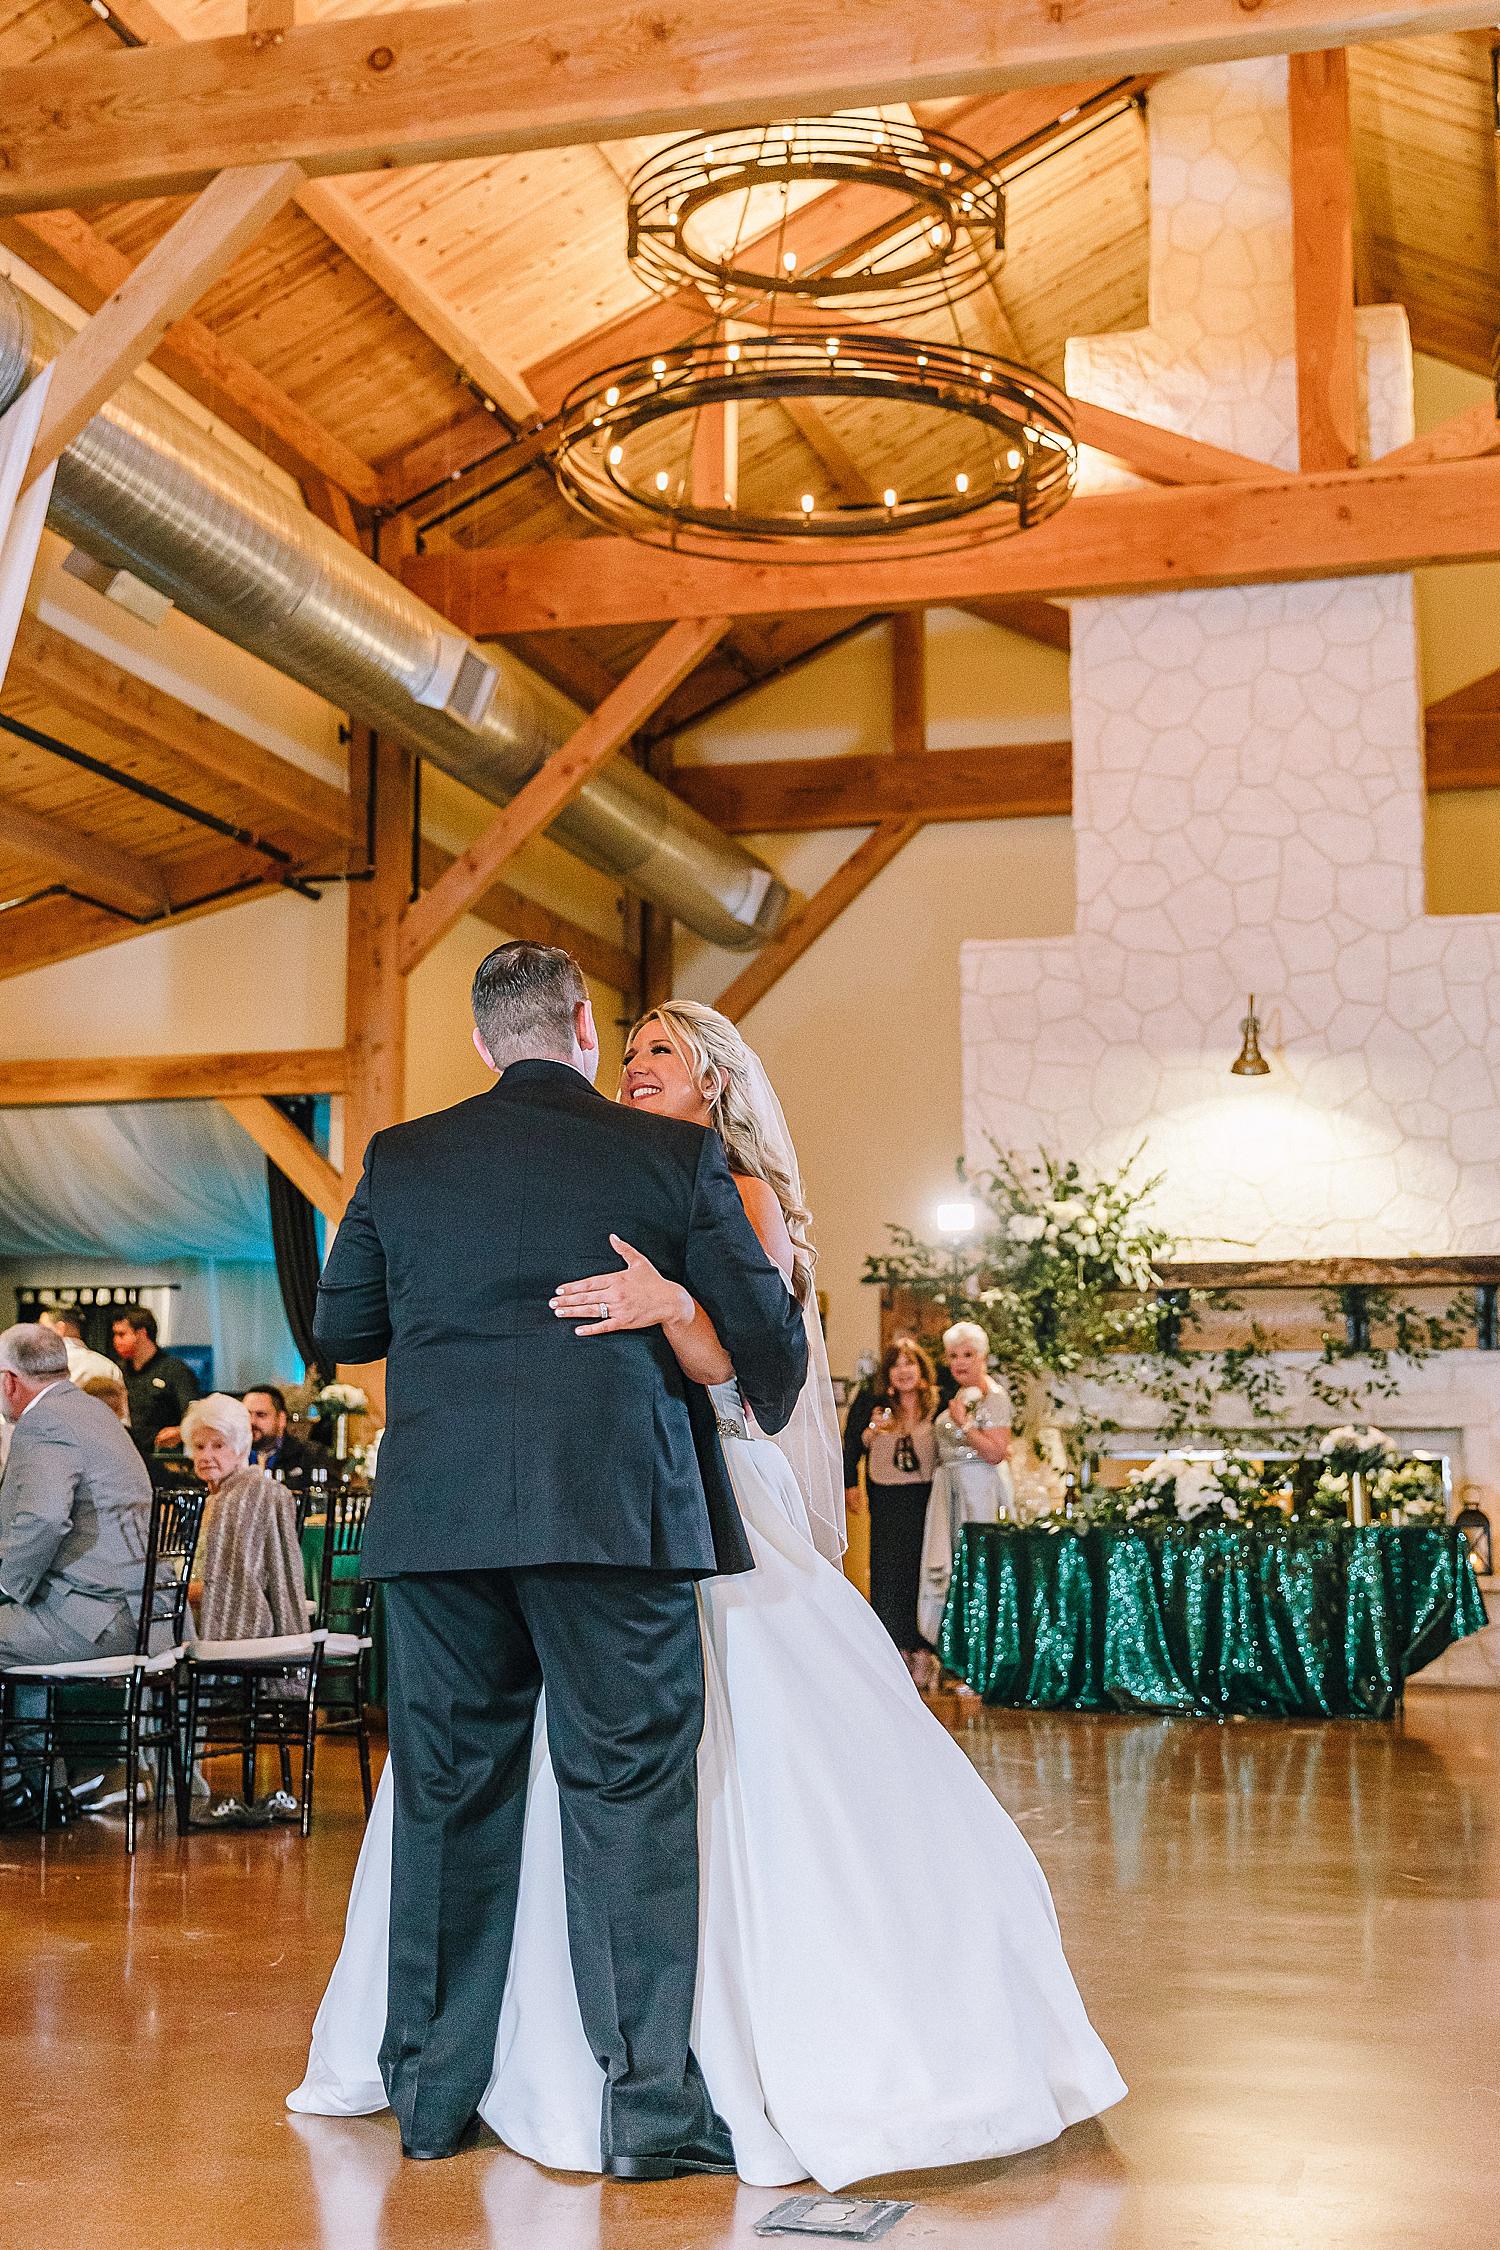 Magnolia-Halle-Wedding-San-Antonio-Texas-Bride-Grom_0110.jpg